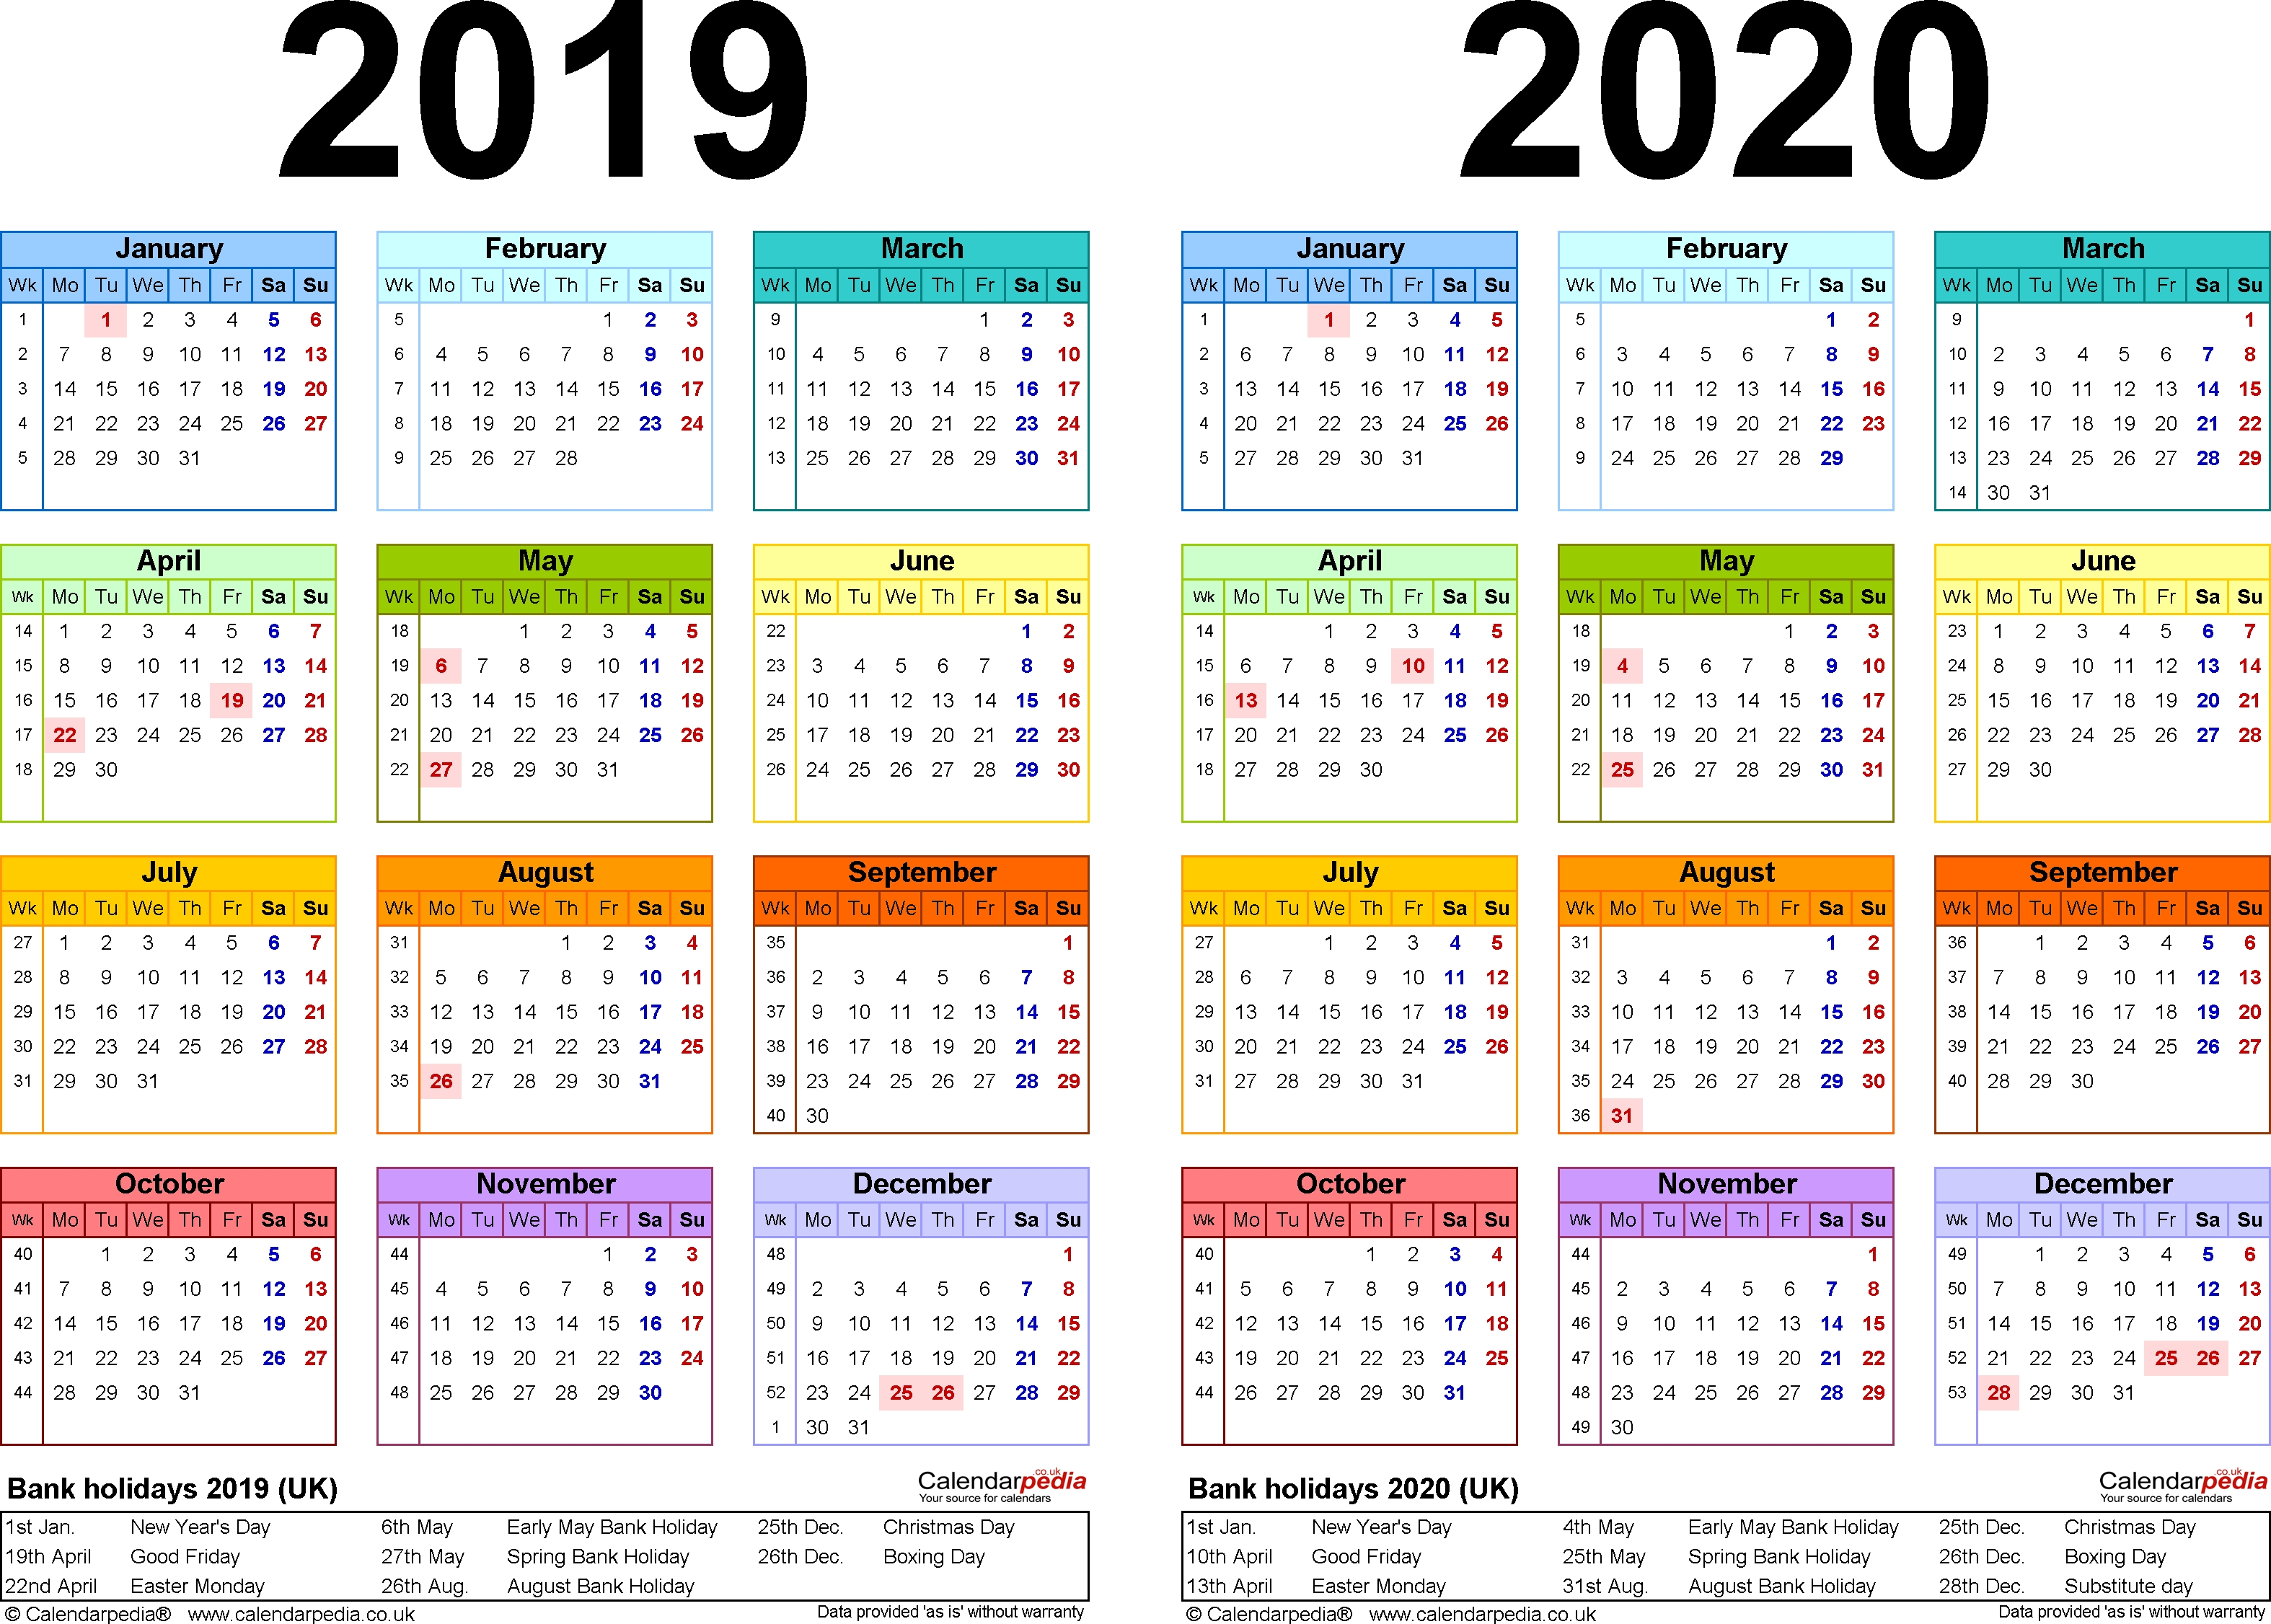 Perky 2 Year Pocket Calendar 2019 And 2020 • Printable Blank 2 Year Pocket Calendar 2019 And 2020